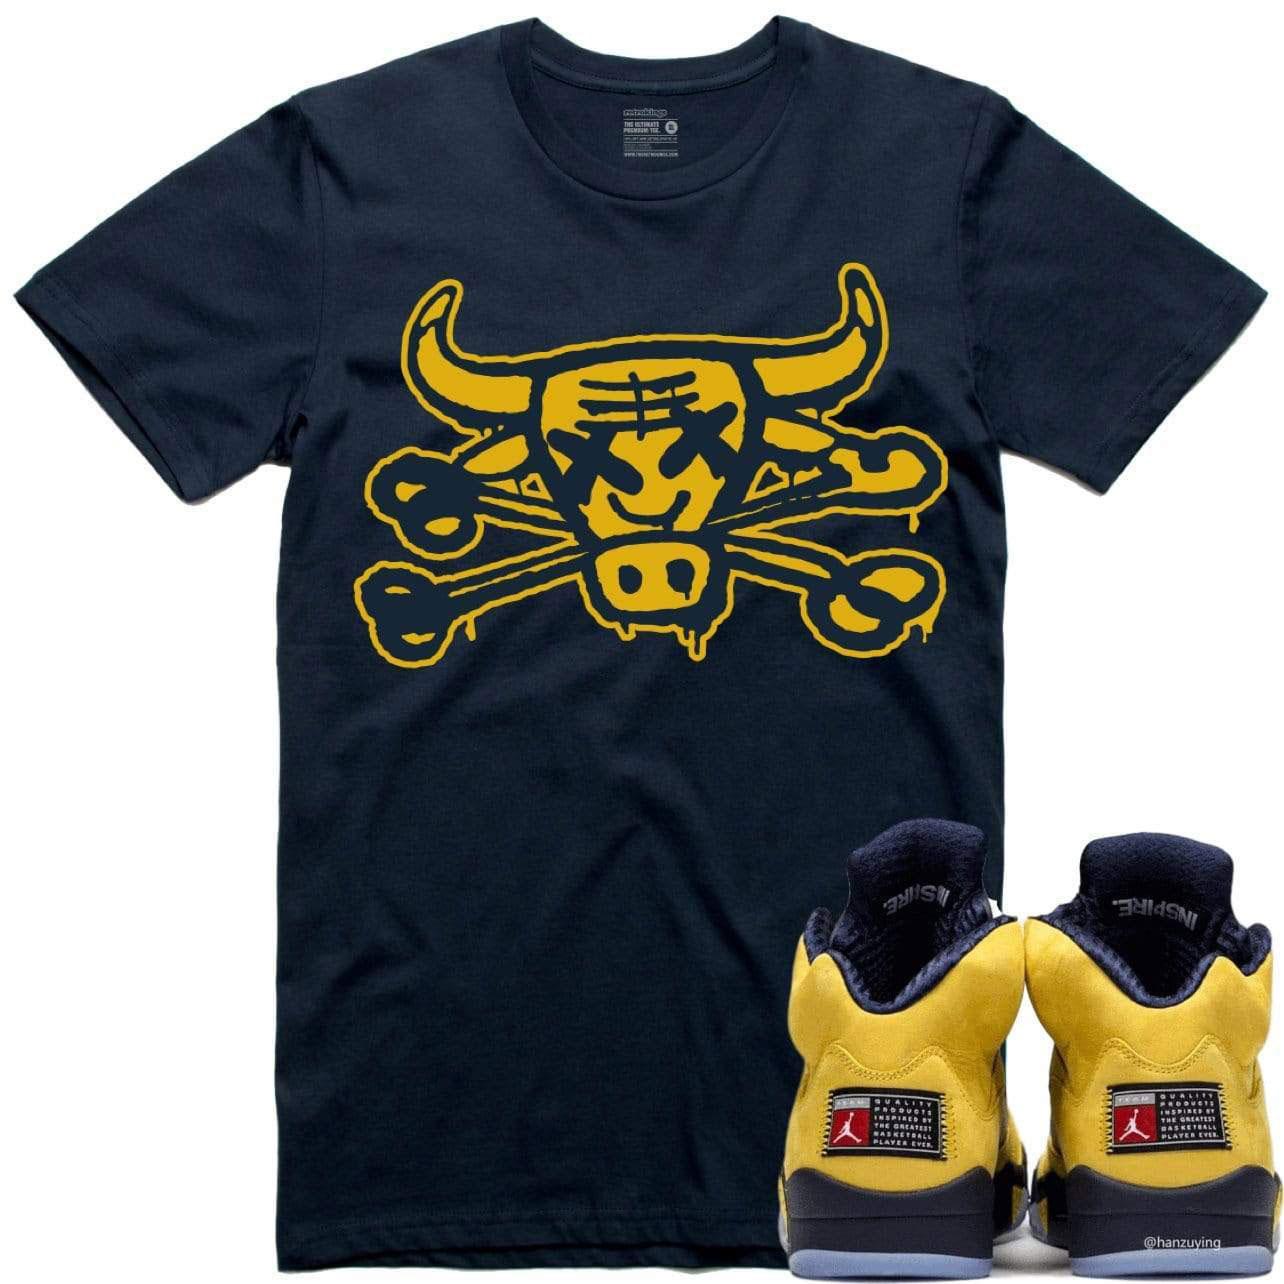 jordan-5-michigan-amarillo-sneaker-tee-shirt-3